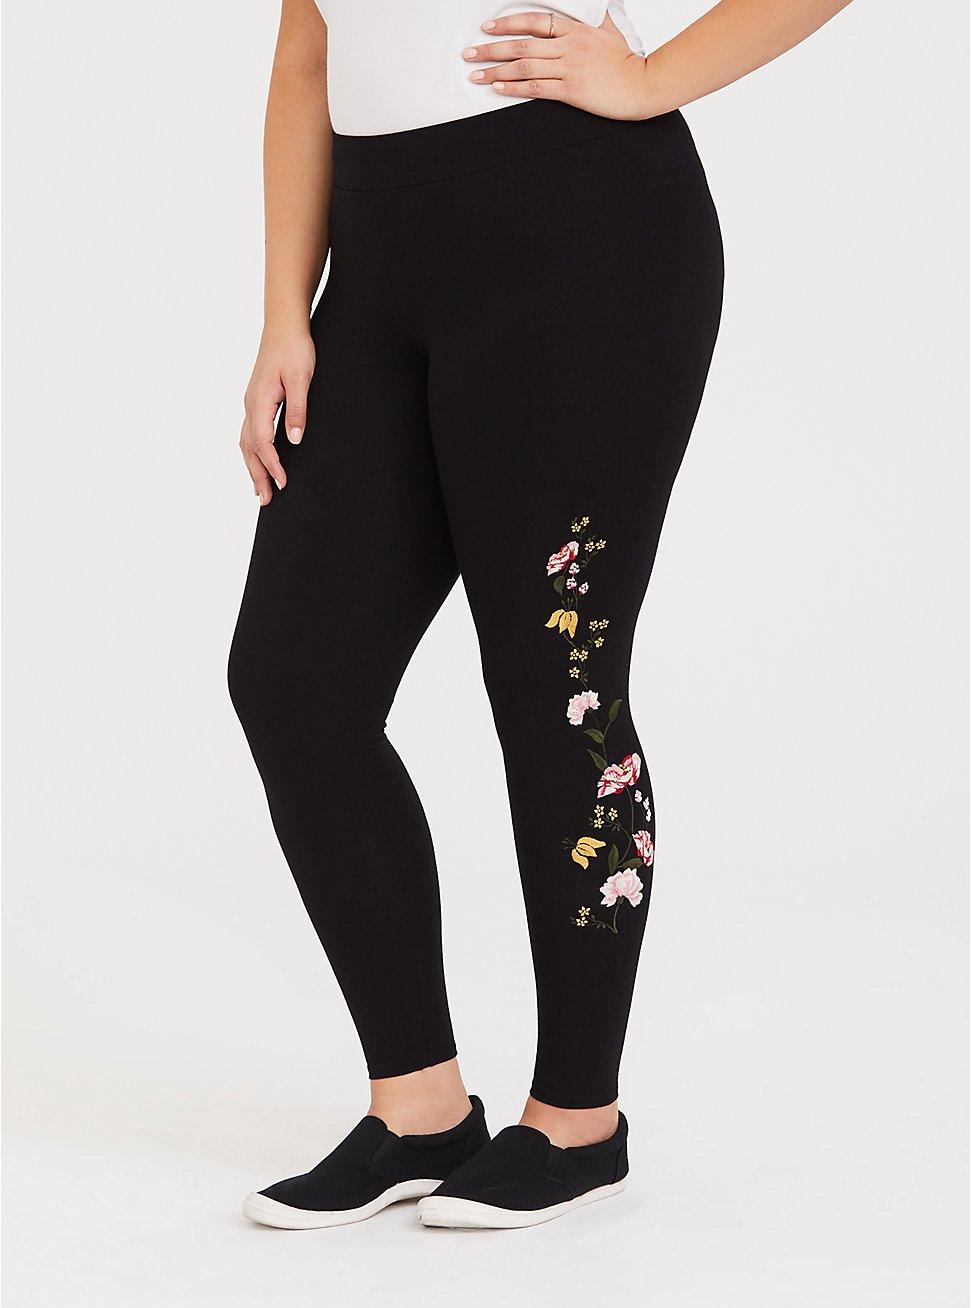 Premium Legging - Embroidered Floral Black, BLACK, hi-res